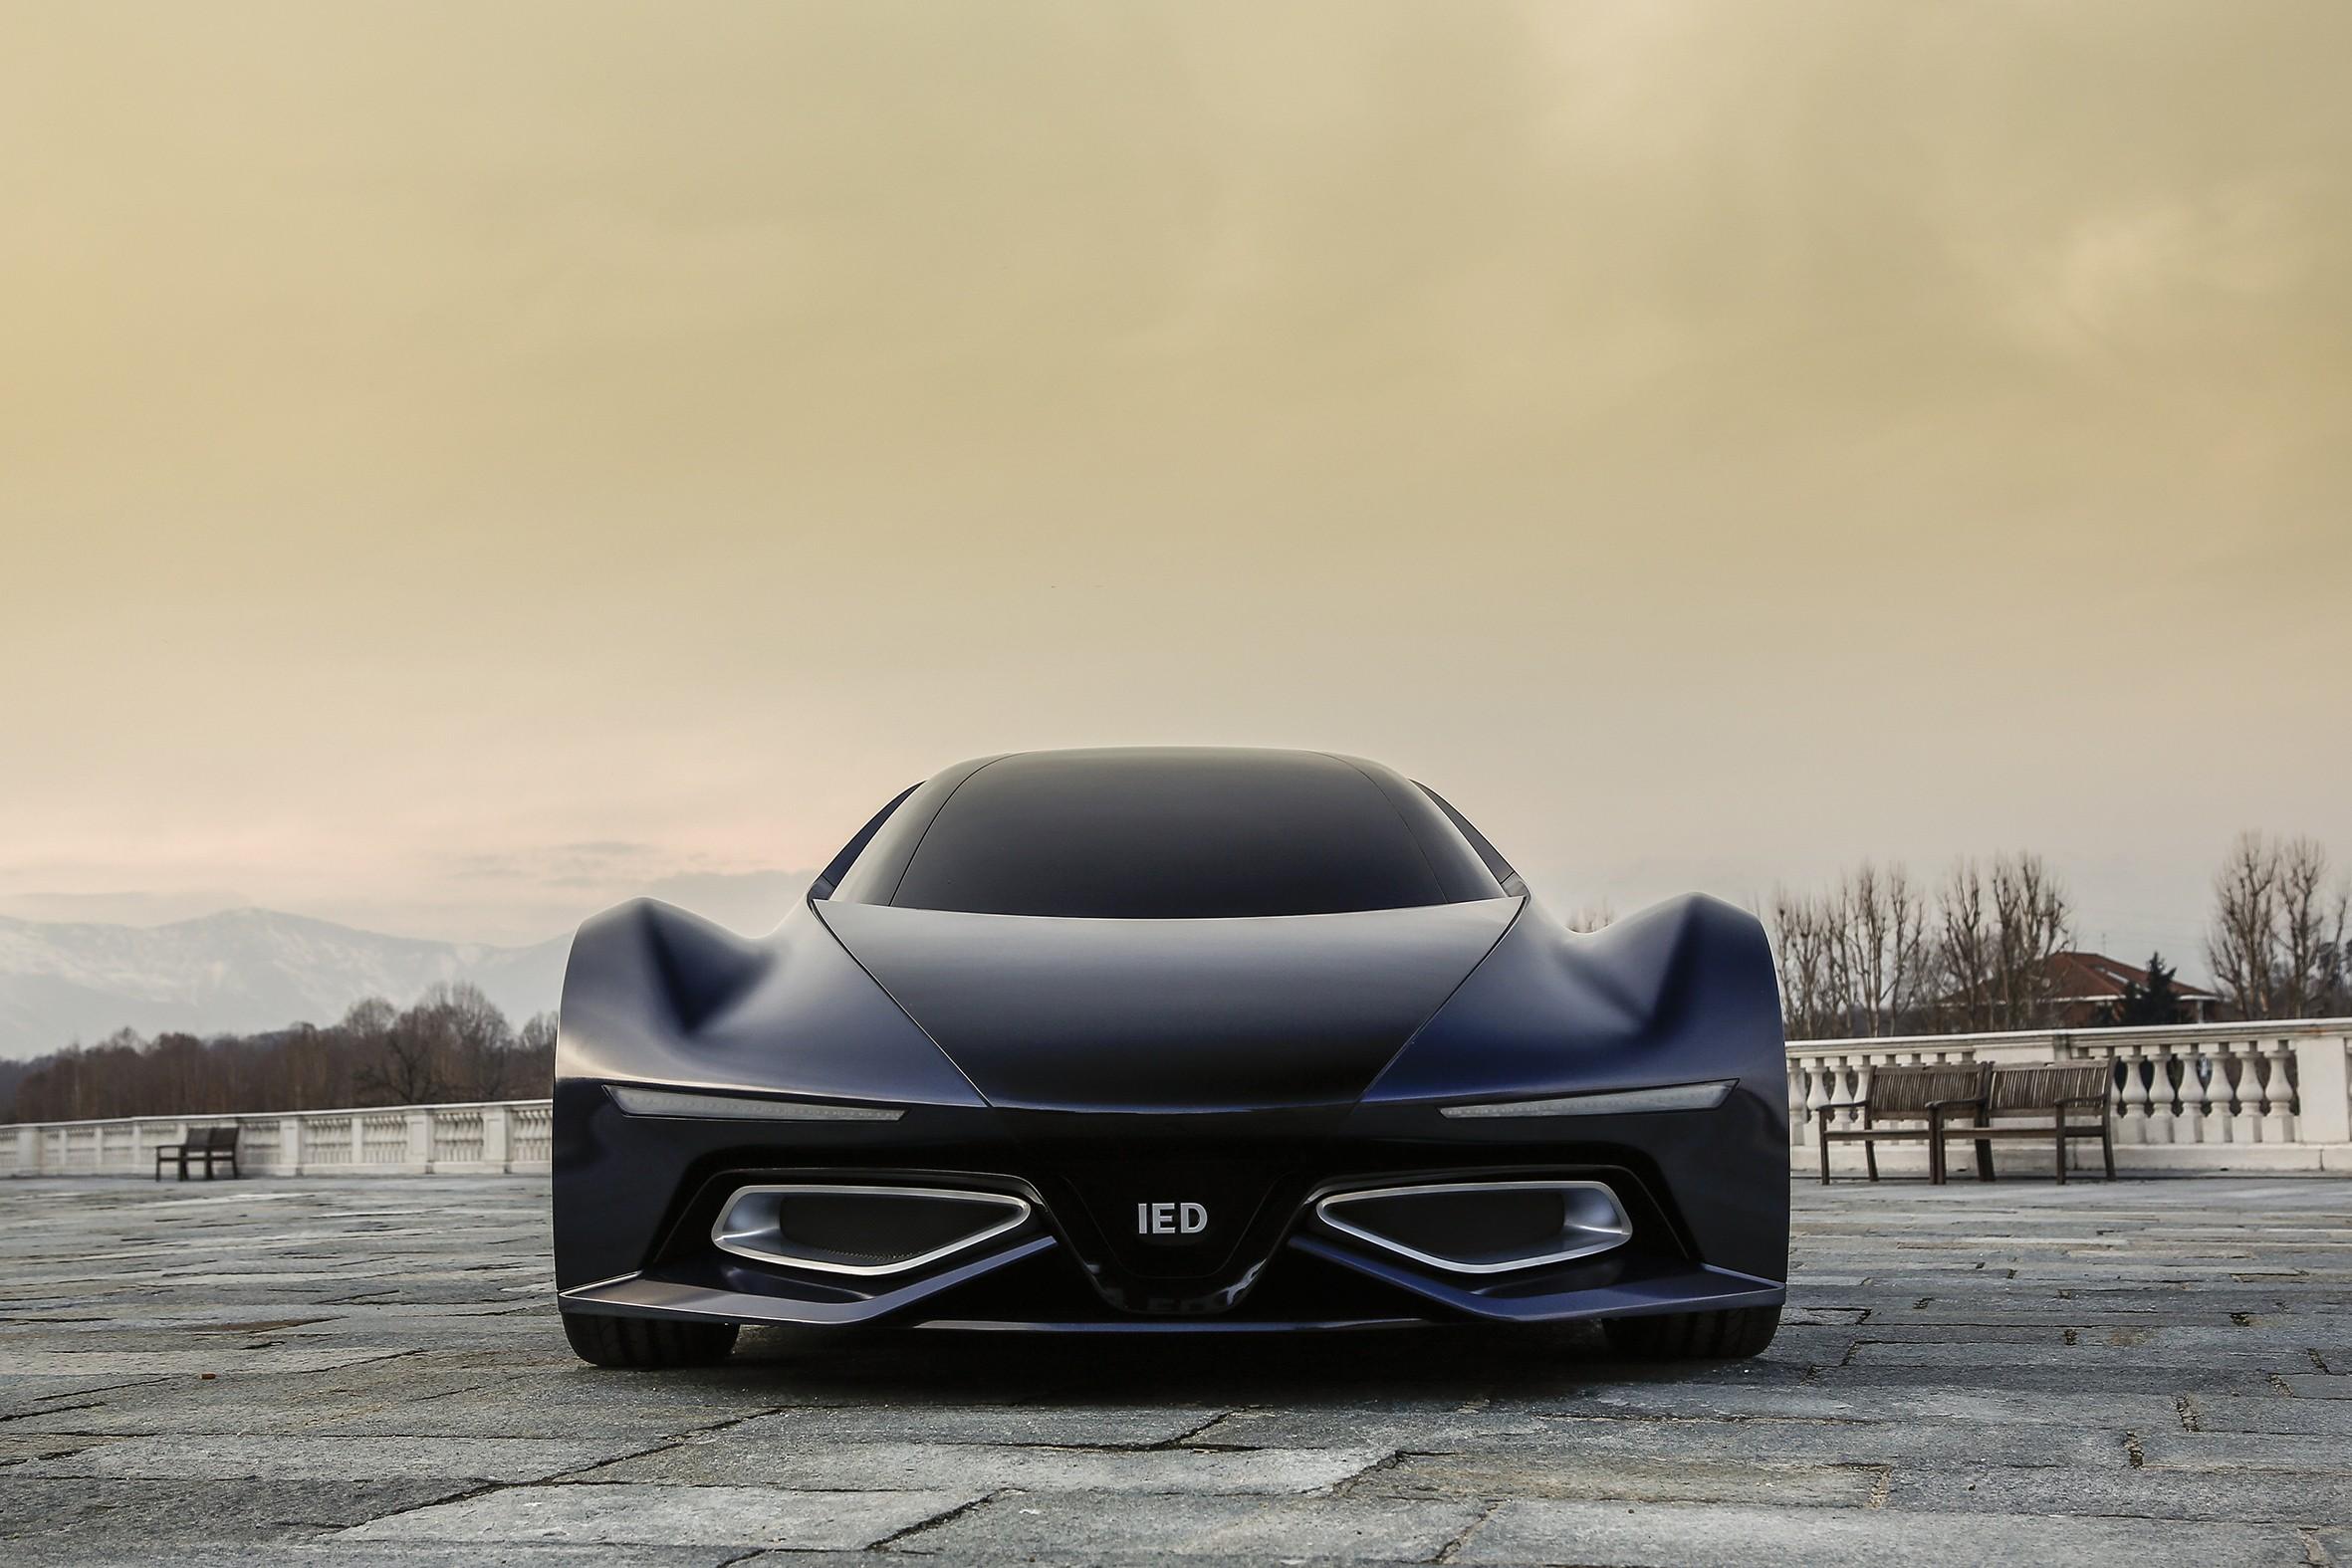 2015 Mustang Concept Car